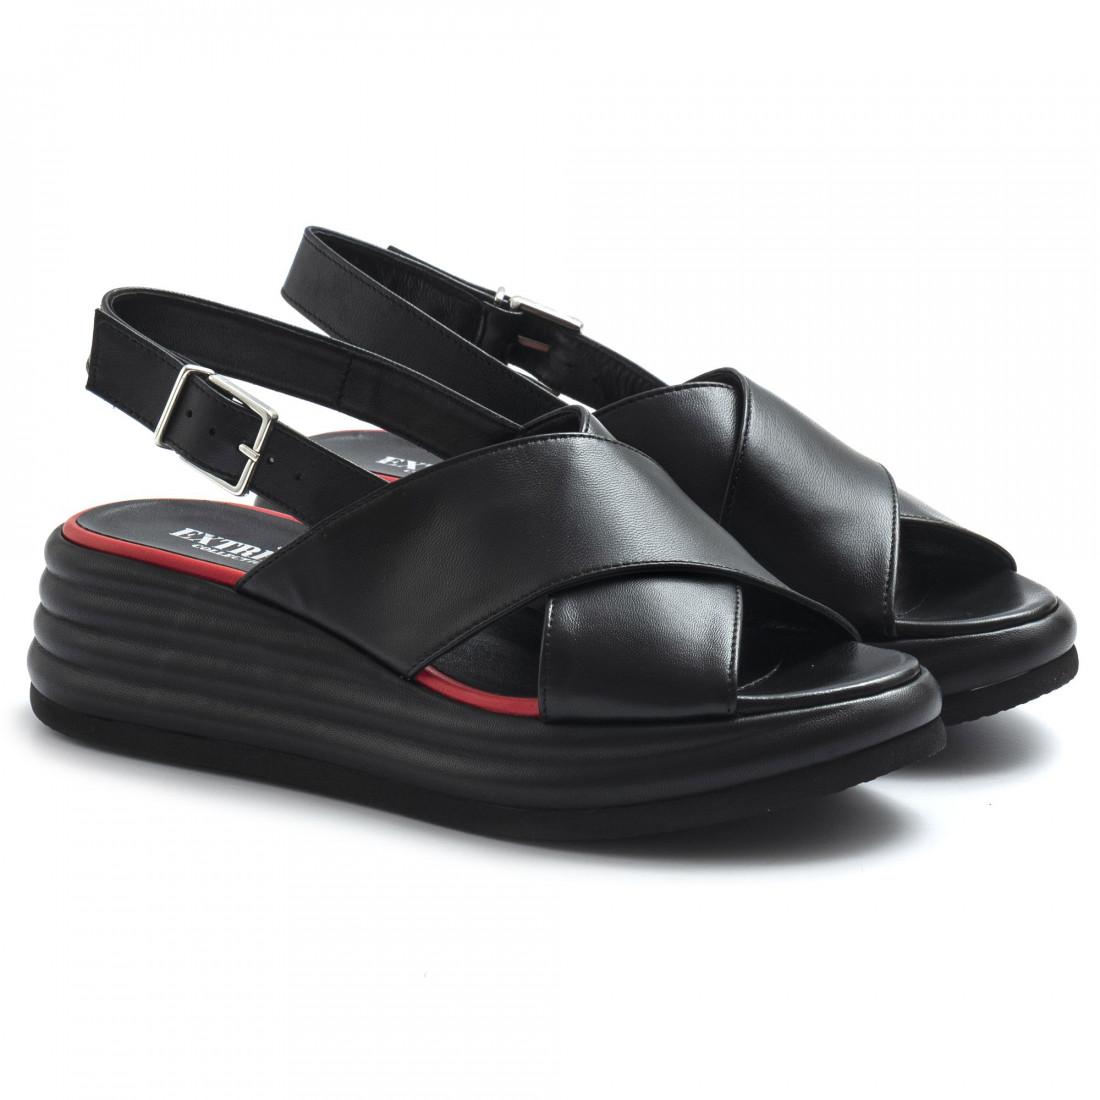 sandals woman extreme 1908jannappa nero 8584